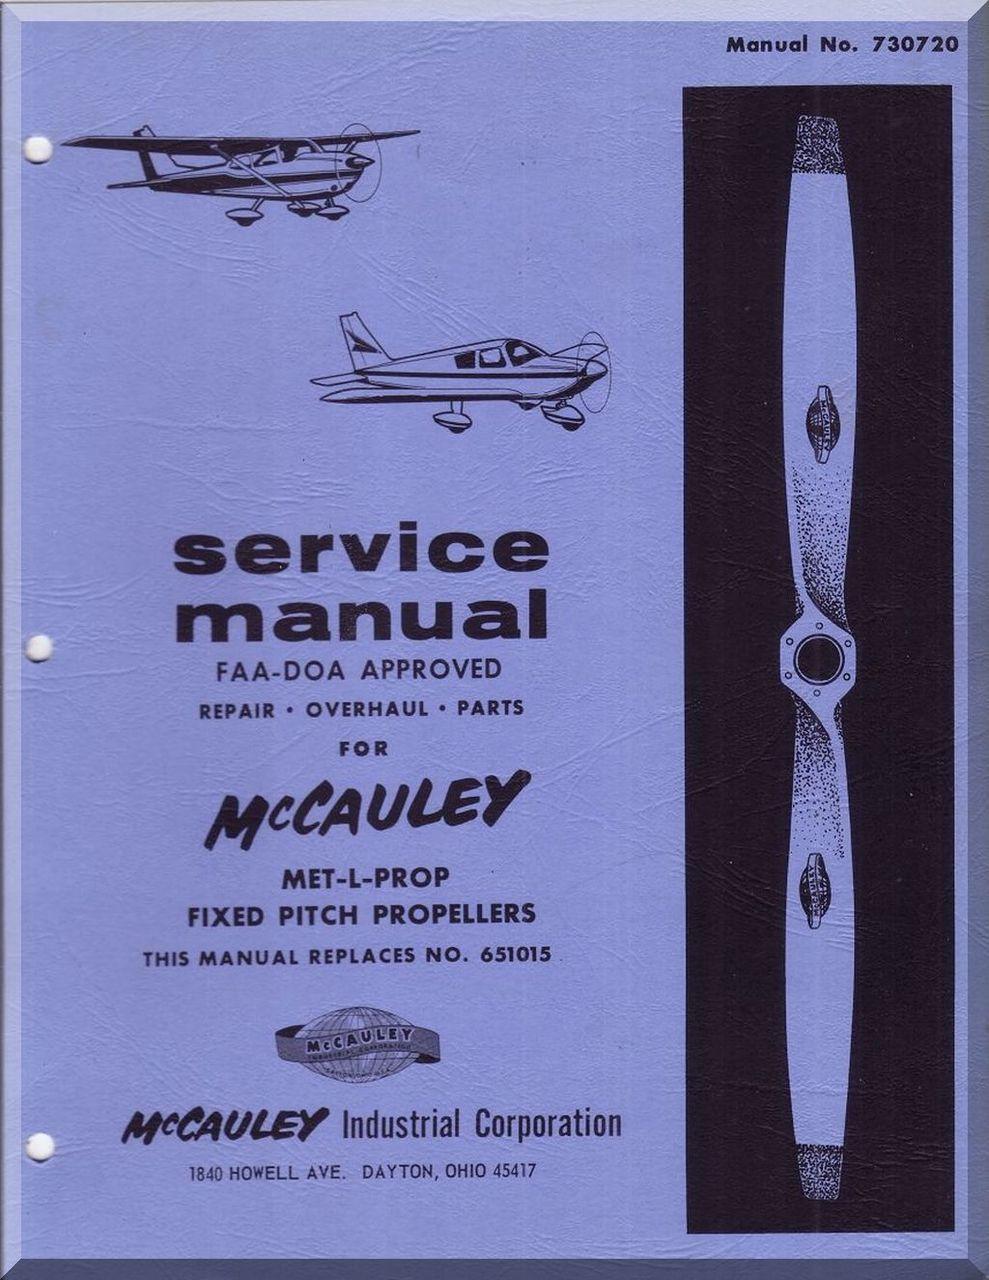 730720 Manual Mtd Tiller Briggs Stratton Carb Pelican Parts Technical Bbs Array Mccauley Met L Prop Fixws Pitch Propellers Aircraft Repair Rh Reports Com